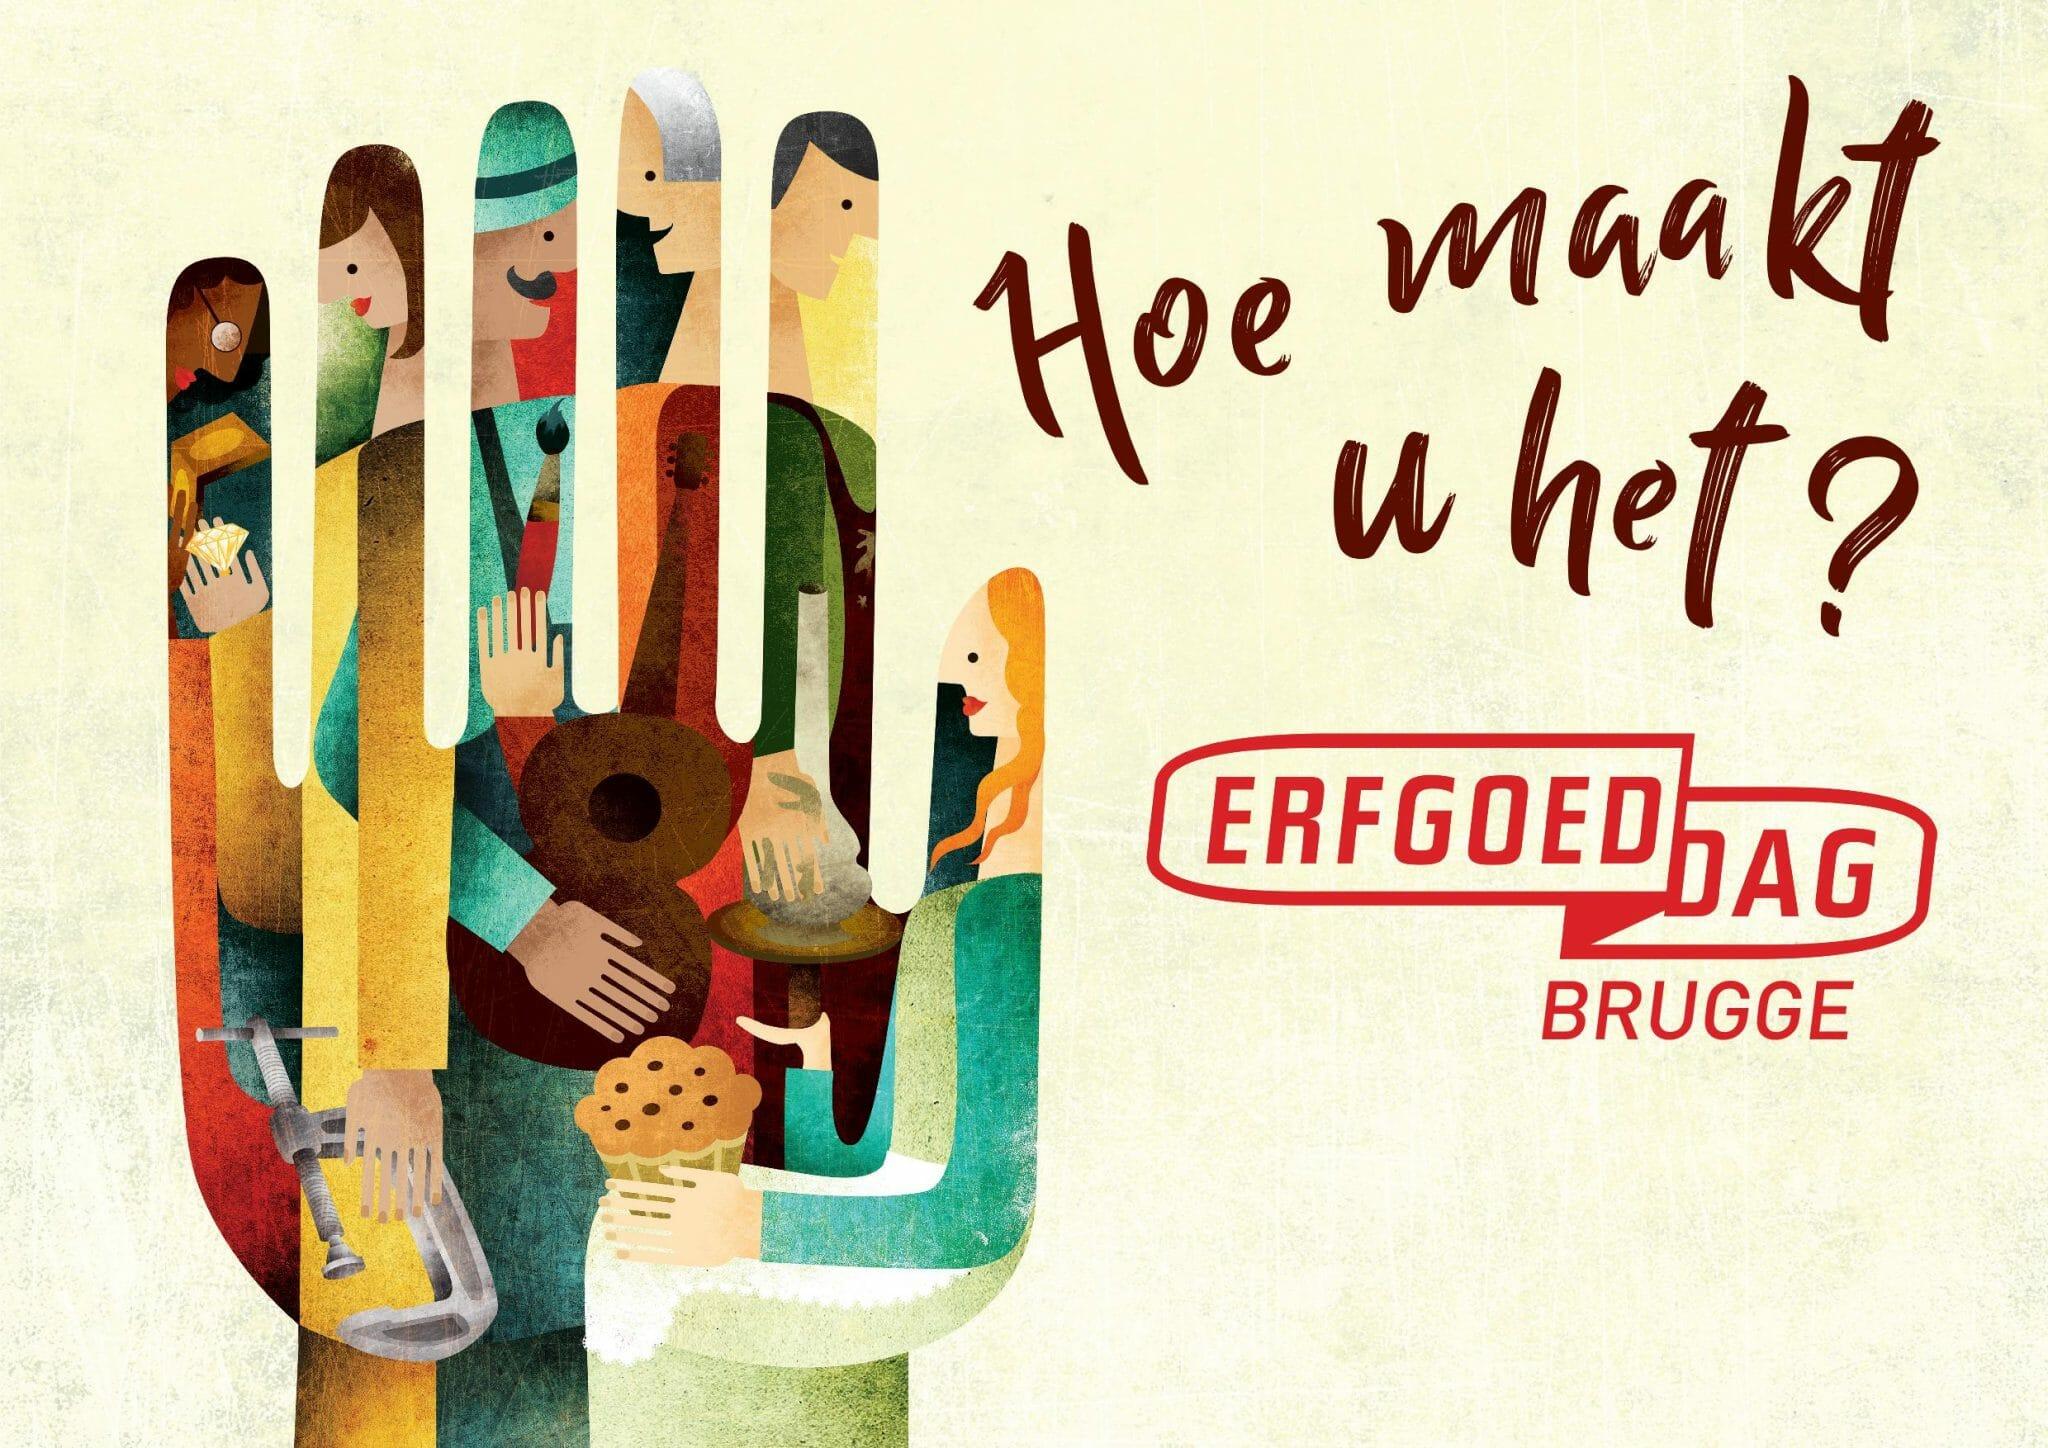 Erfgoeddag Brugge